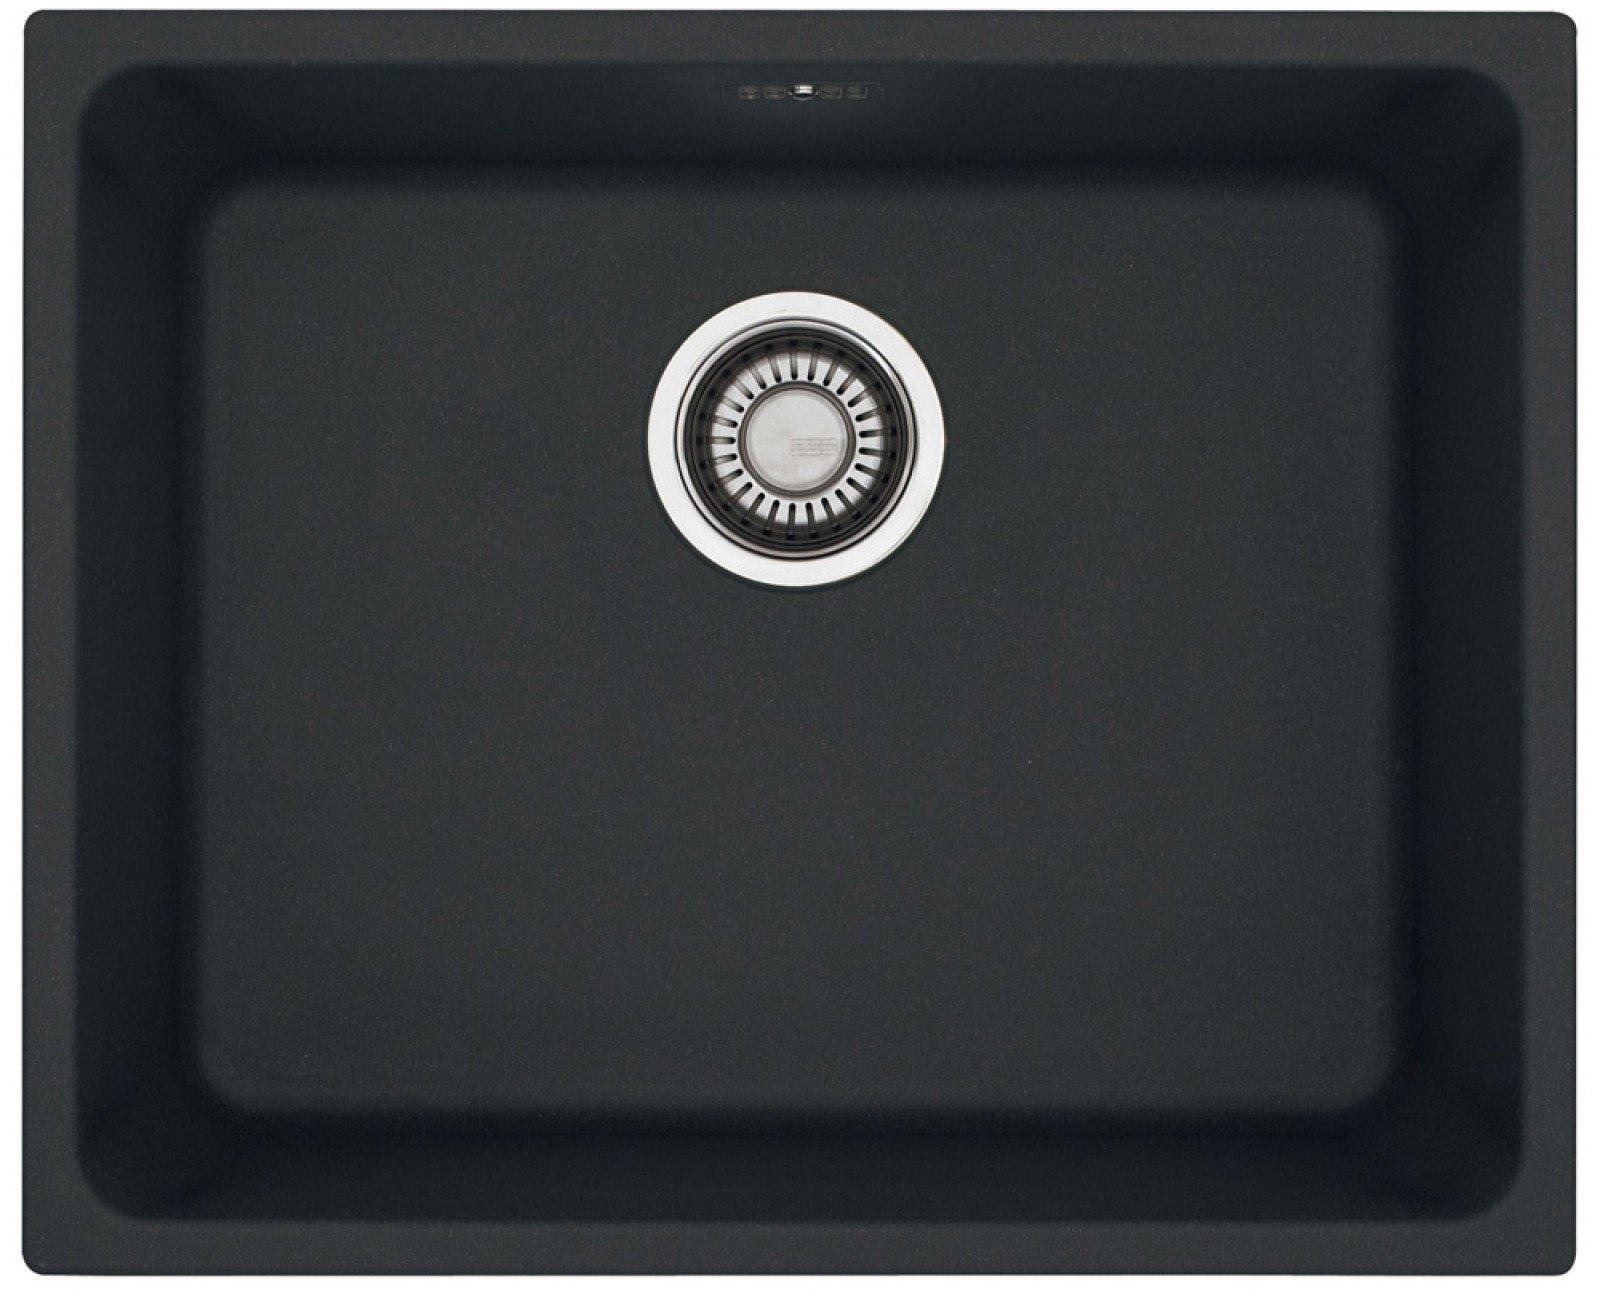 Keittiöallas Franke Kubus KBG 110 50 540×440 mm Fragranite musta  Taloon com